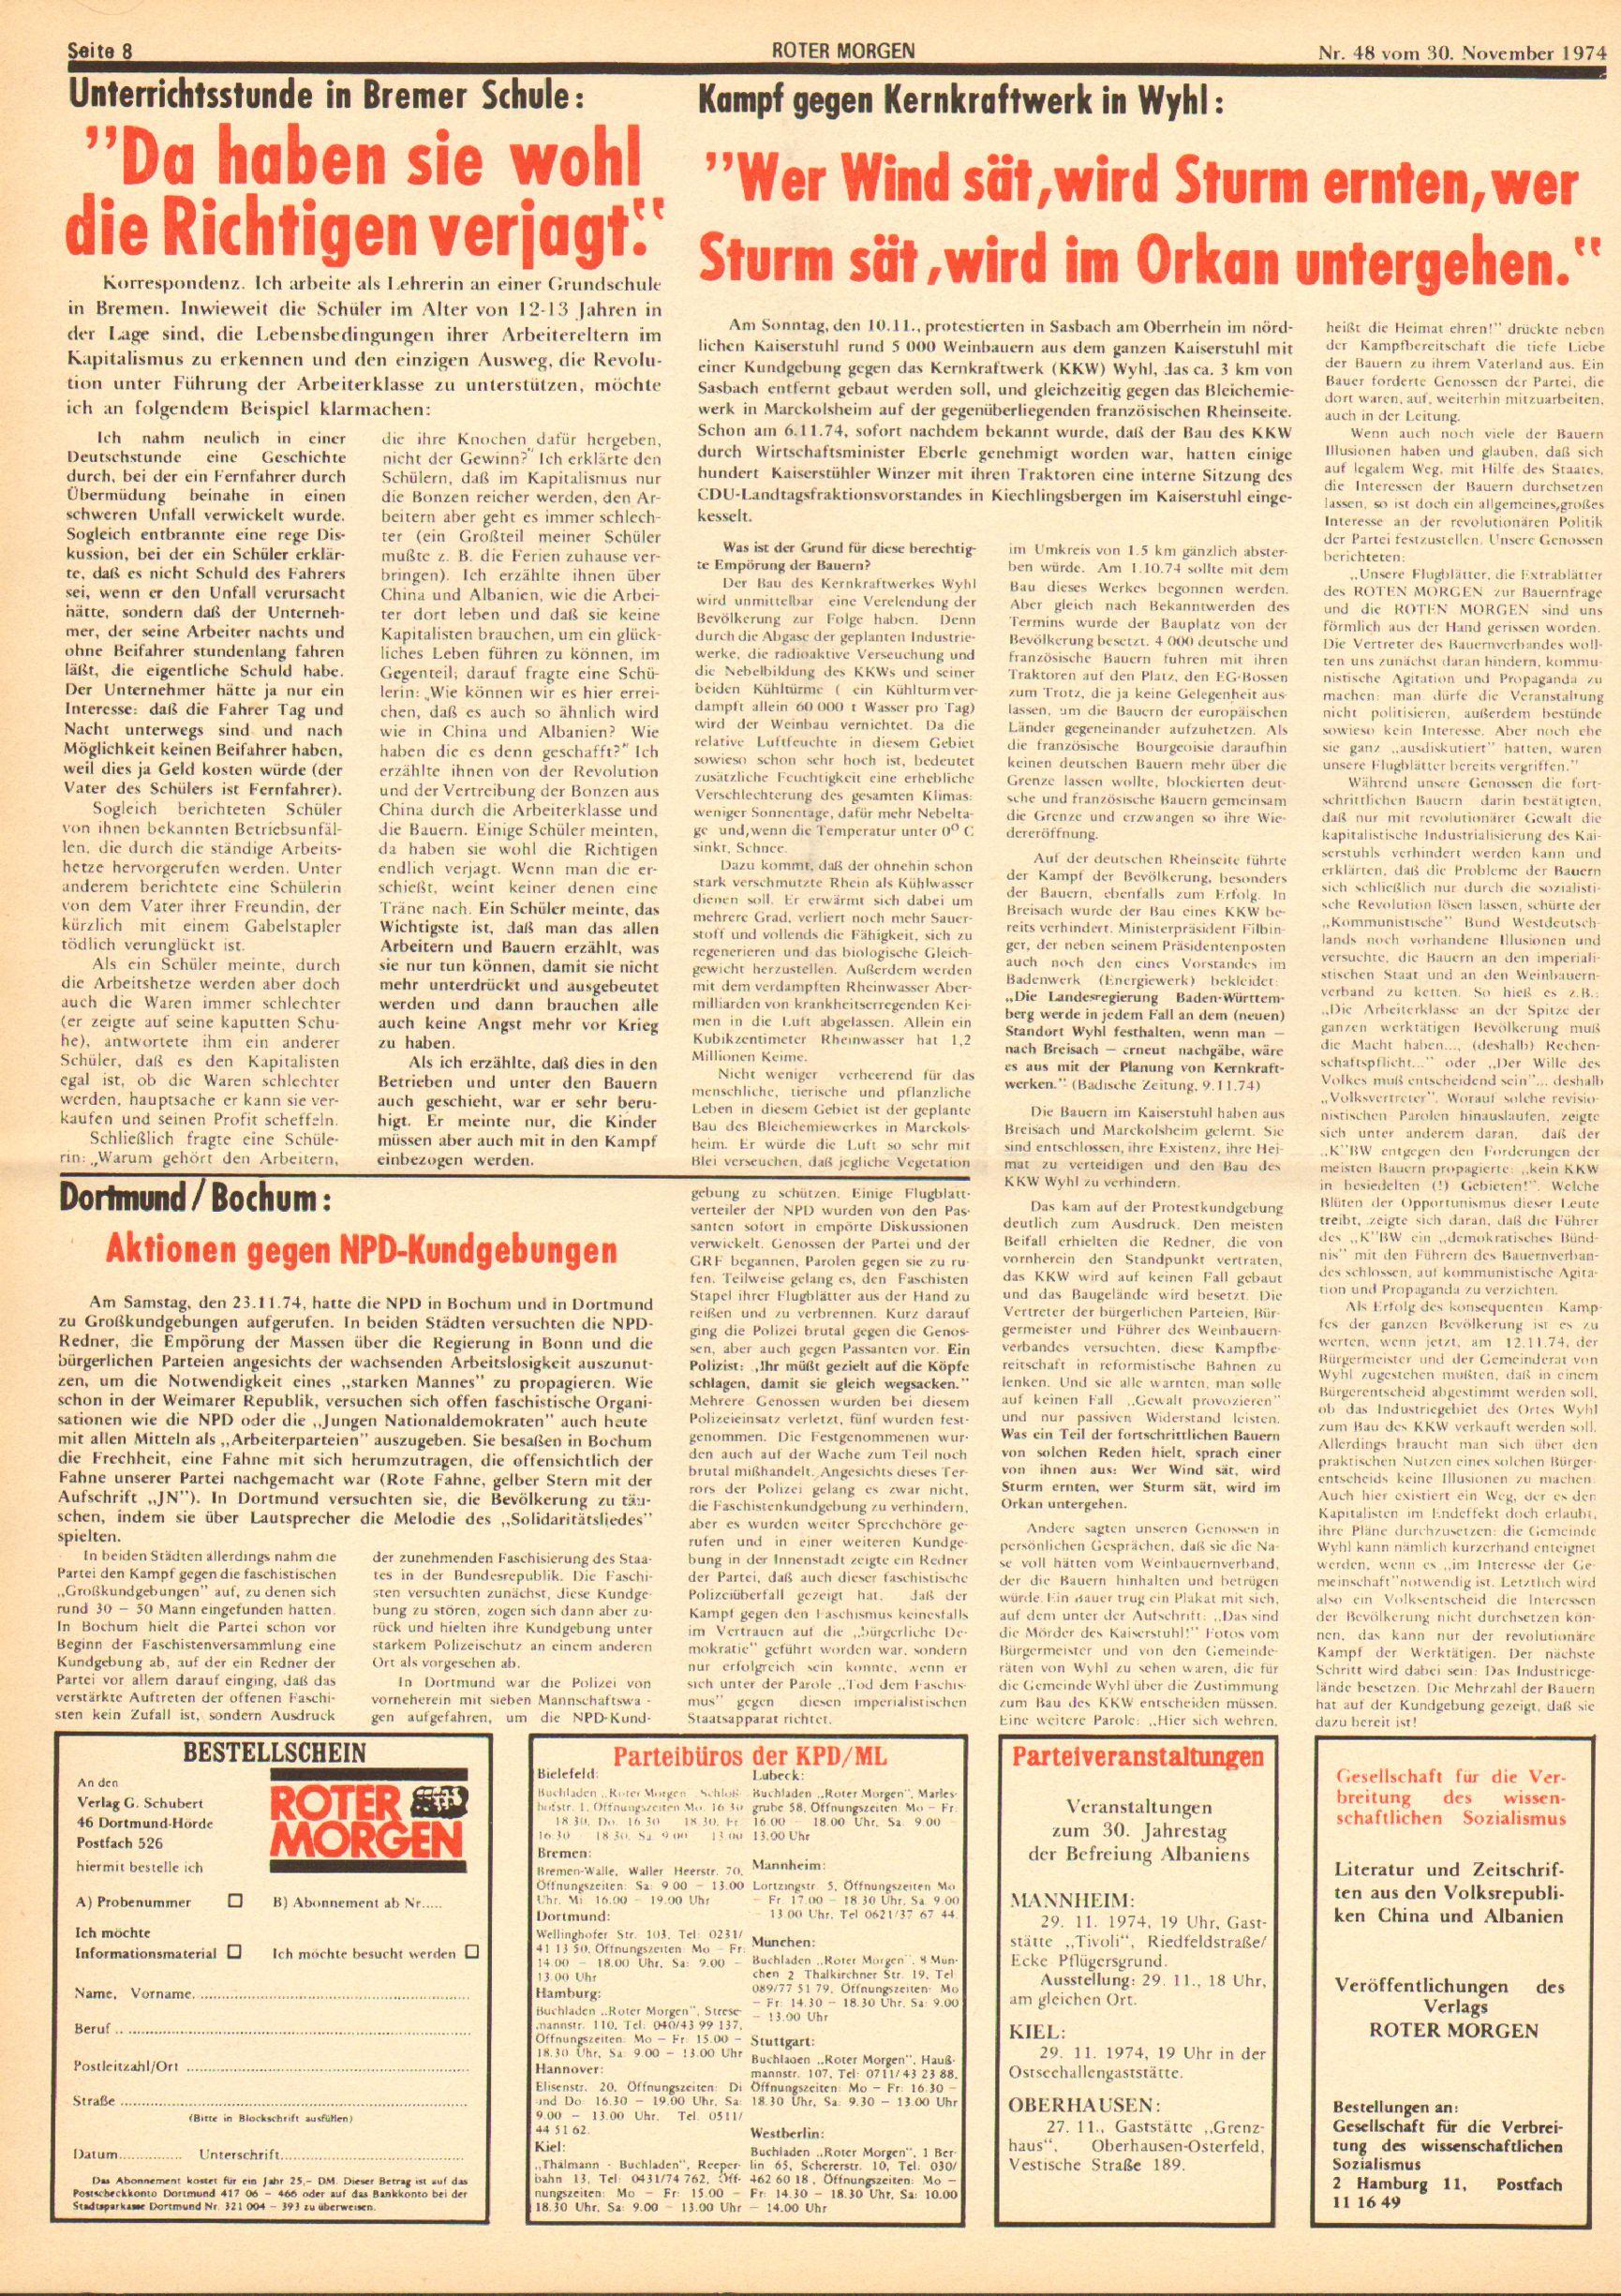 Roter Morgen, 8. Jg., 30. November 1974, Nr. 48, Seite 8